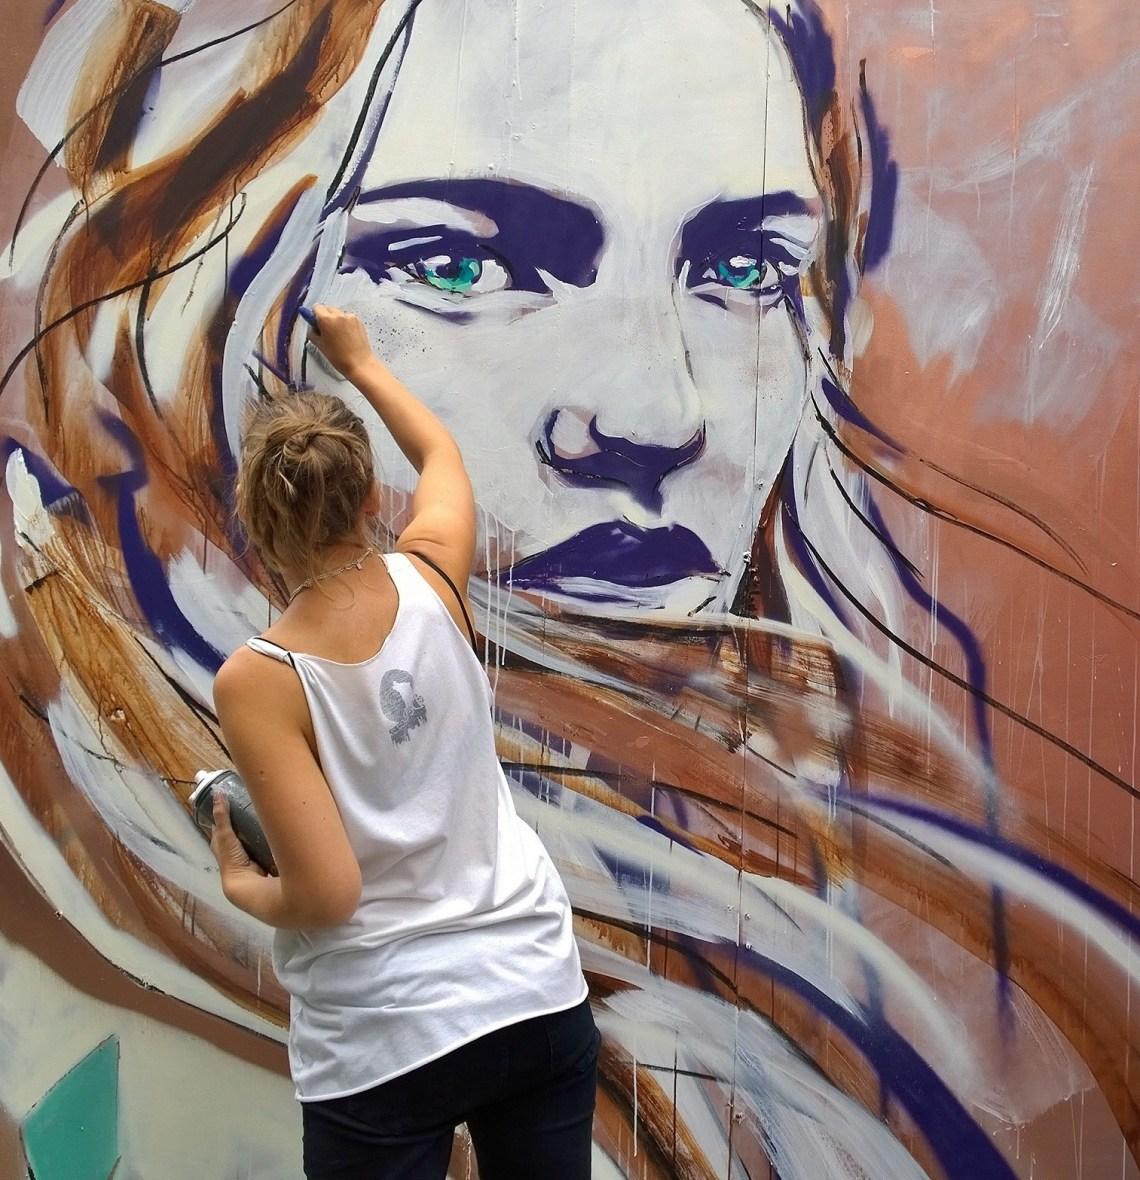 Hannah Adamaszek painting during the Whitecross Street festival.